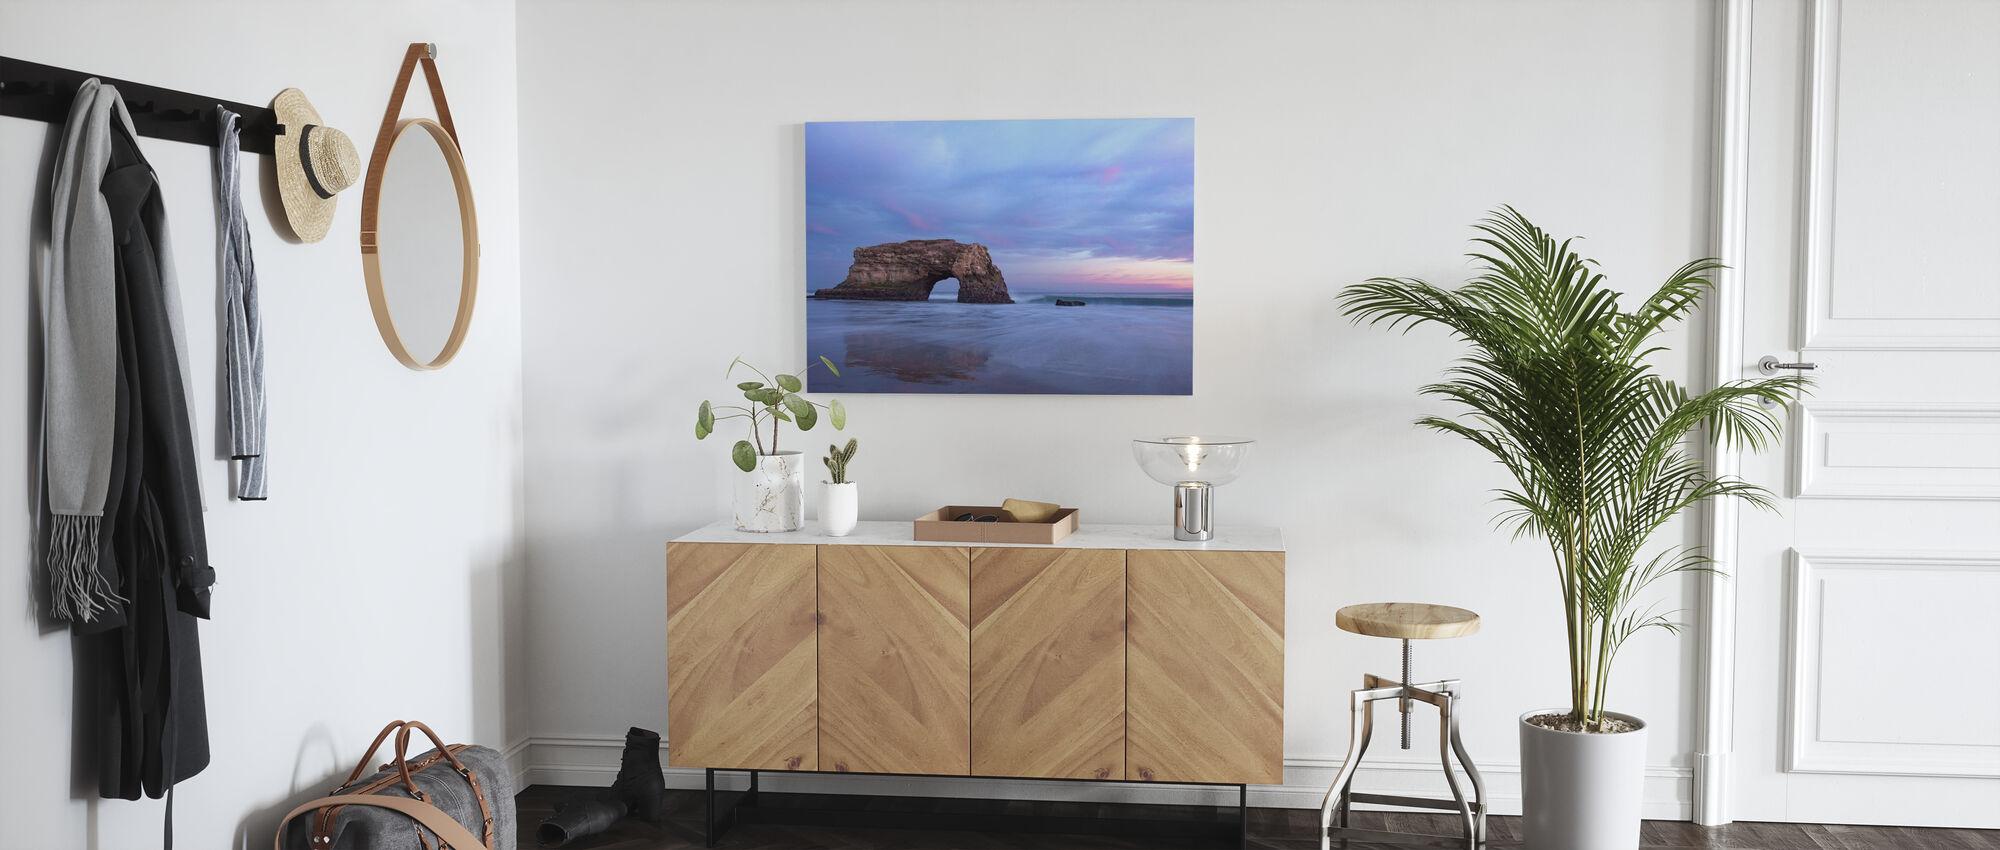 Serenity Shoreline - Canvas print - Hallway